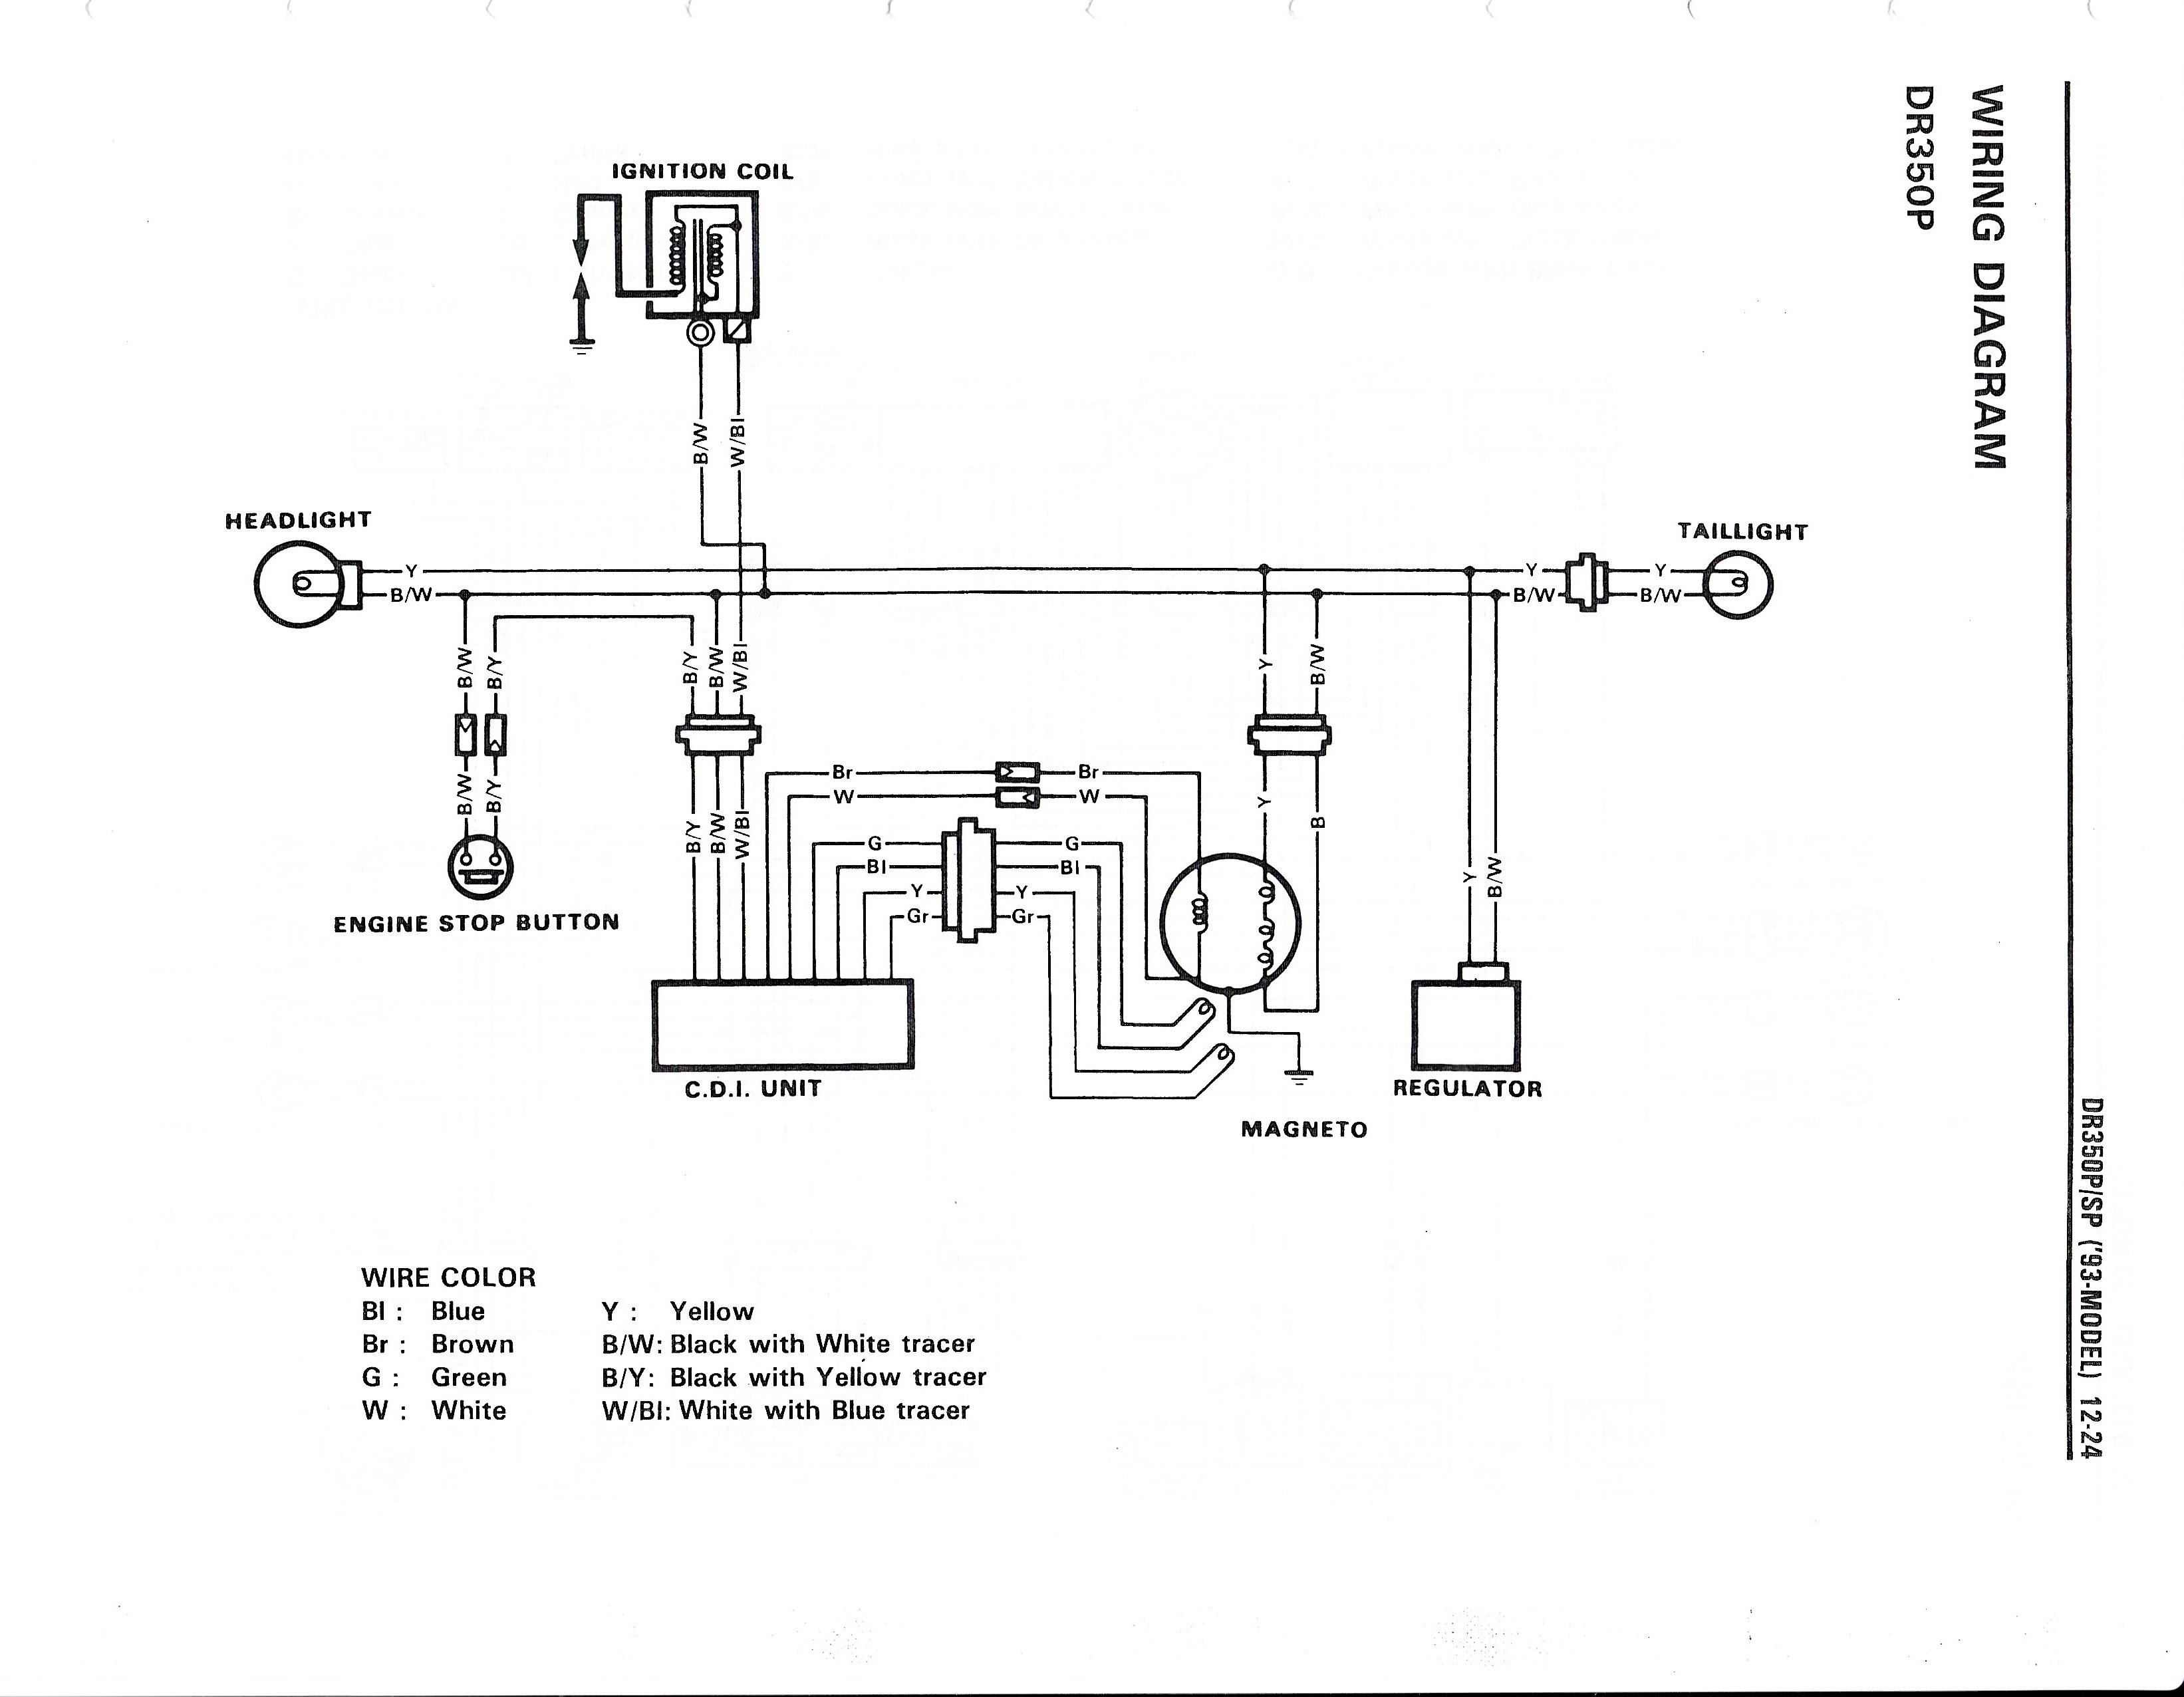 Diagram 1994 Dr350 Wiring Diagram Full Version Hd Quality Wiring Diagram Oilschematics1j Romaindanza It